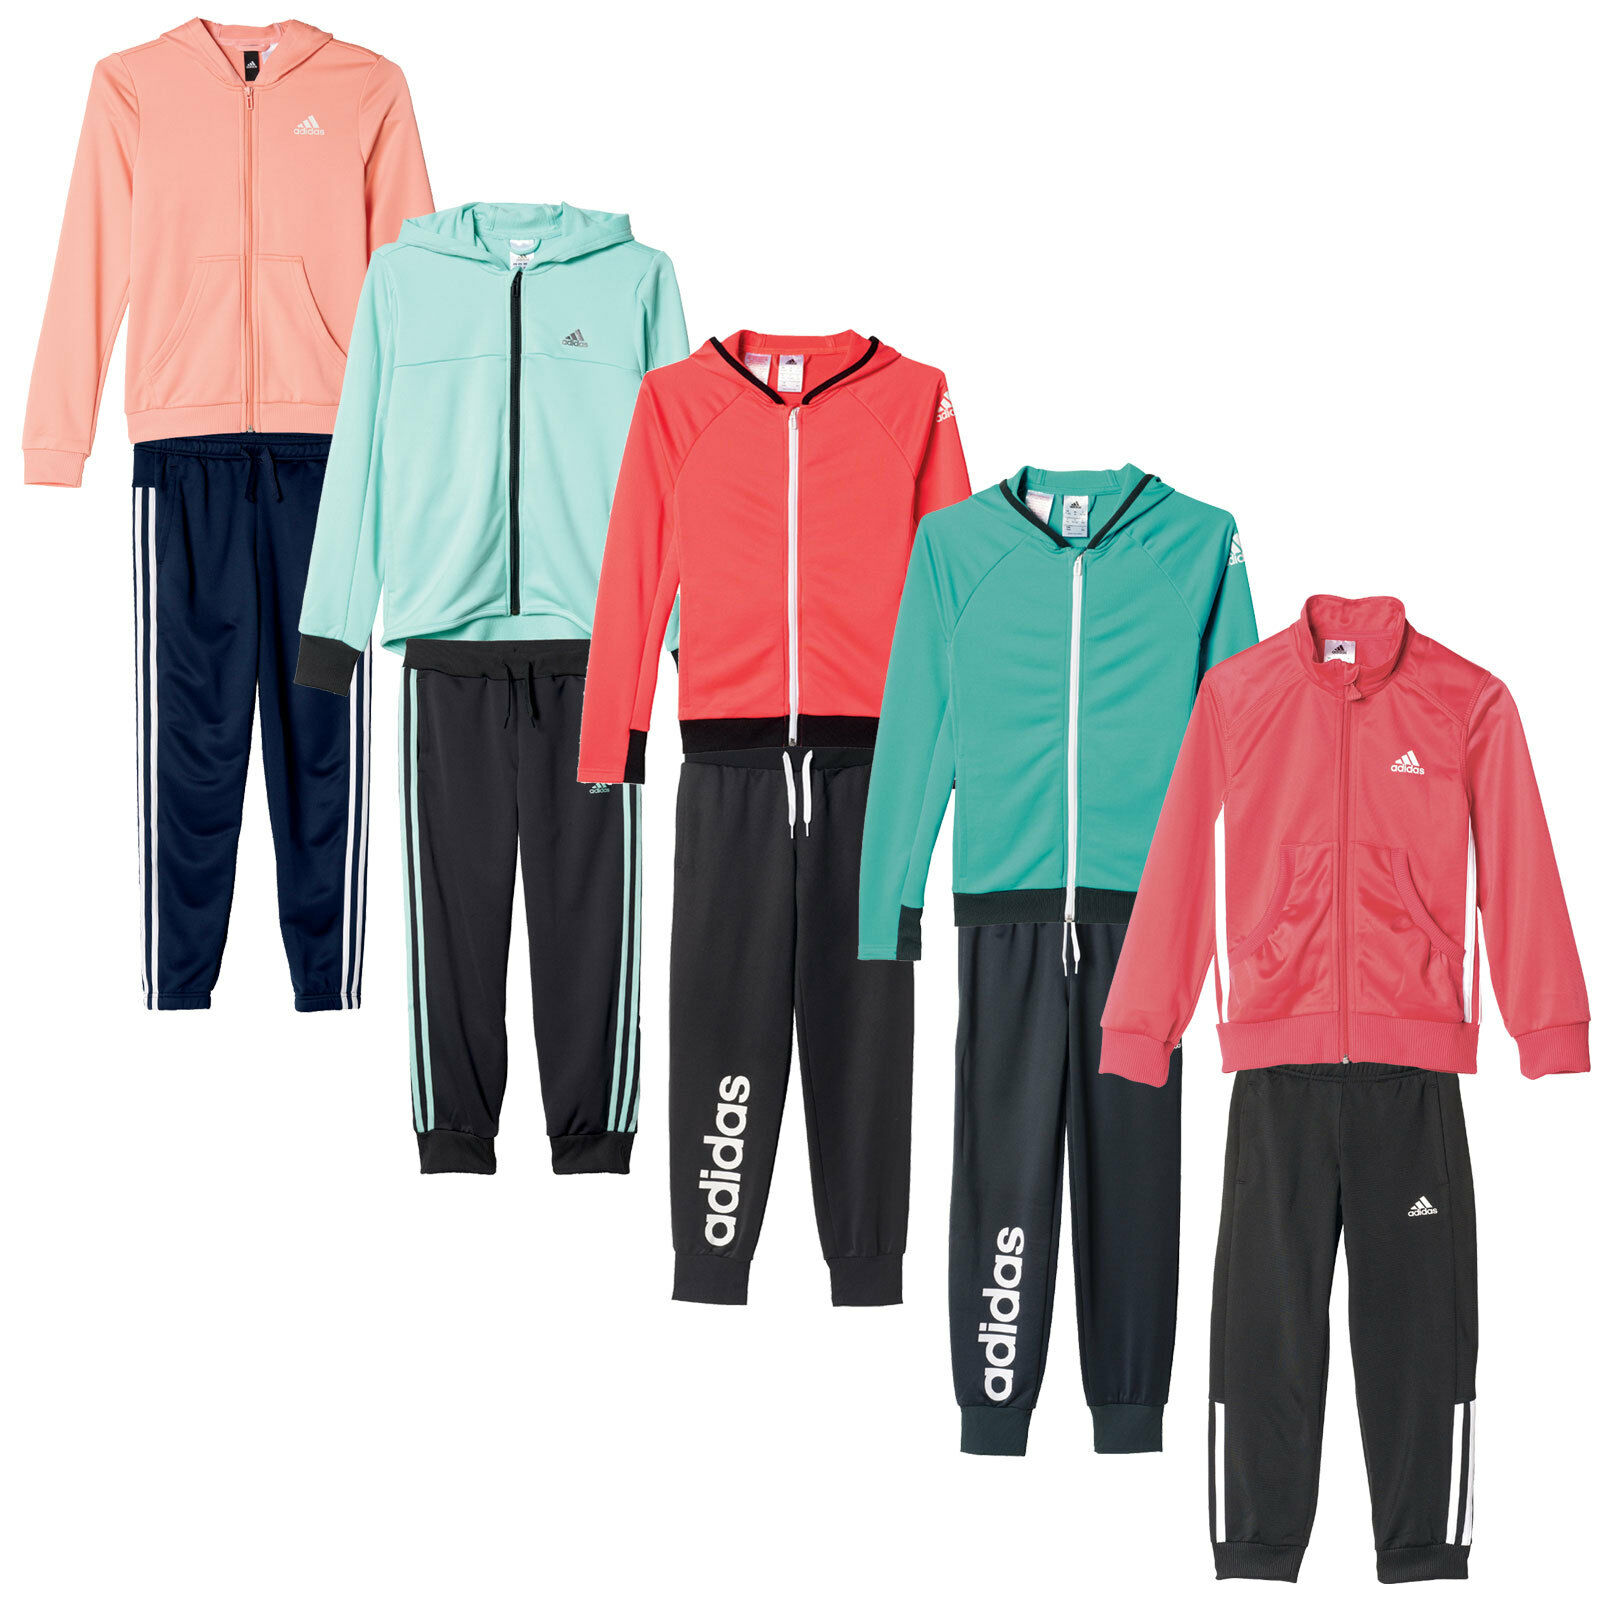 adidas Performance Mädchen-Jogginganzug Trainingsanzug Sportanzug Set Kinder NEU